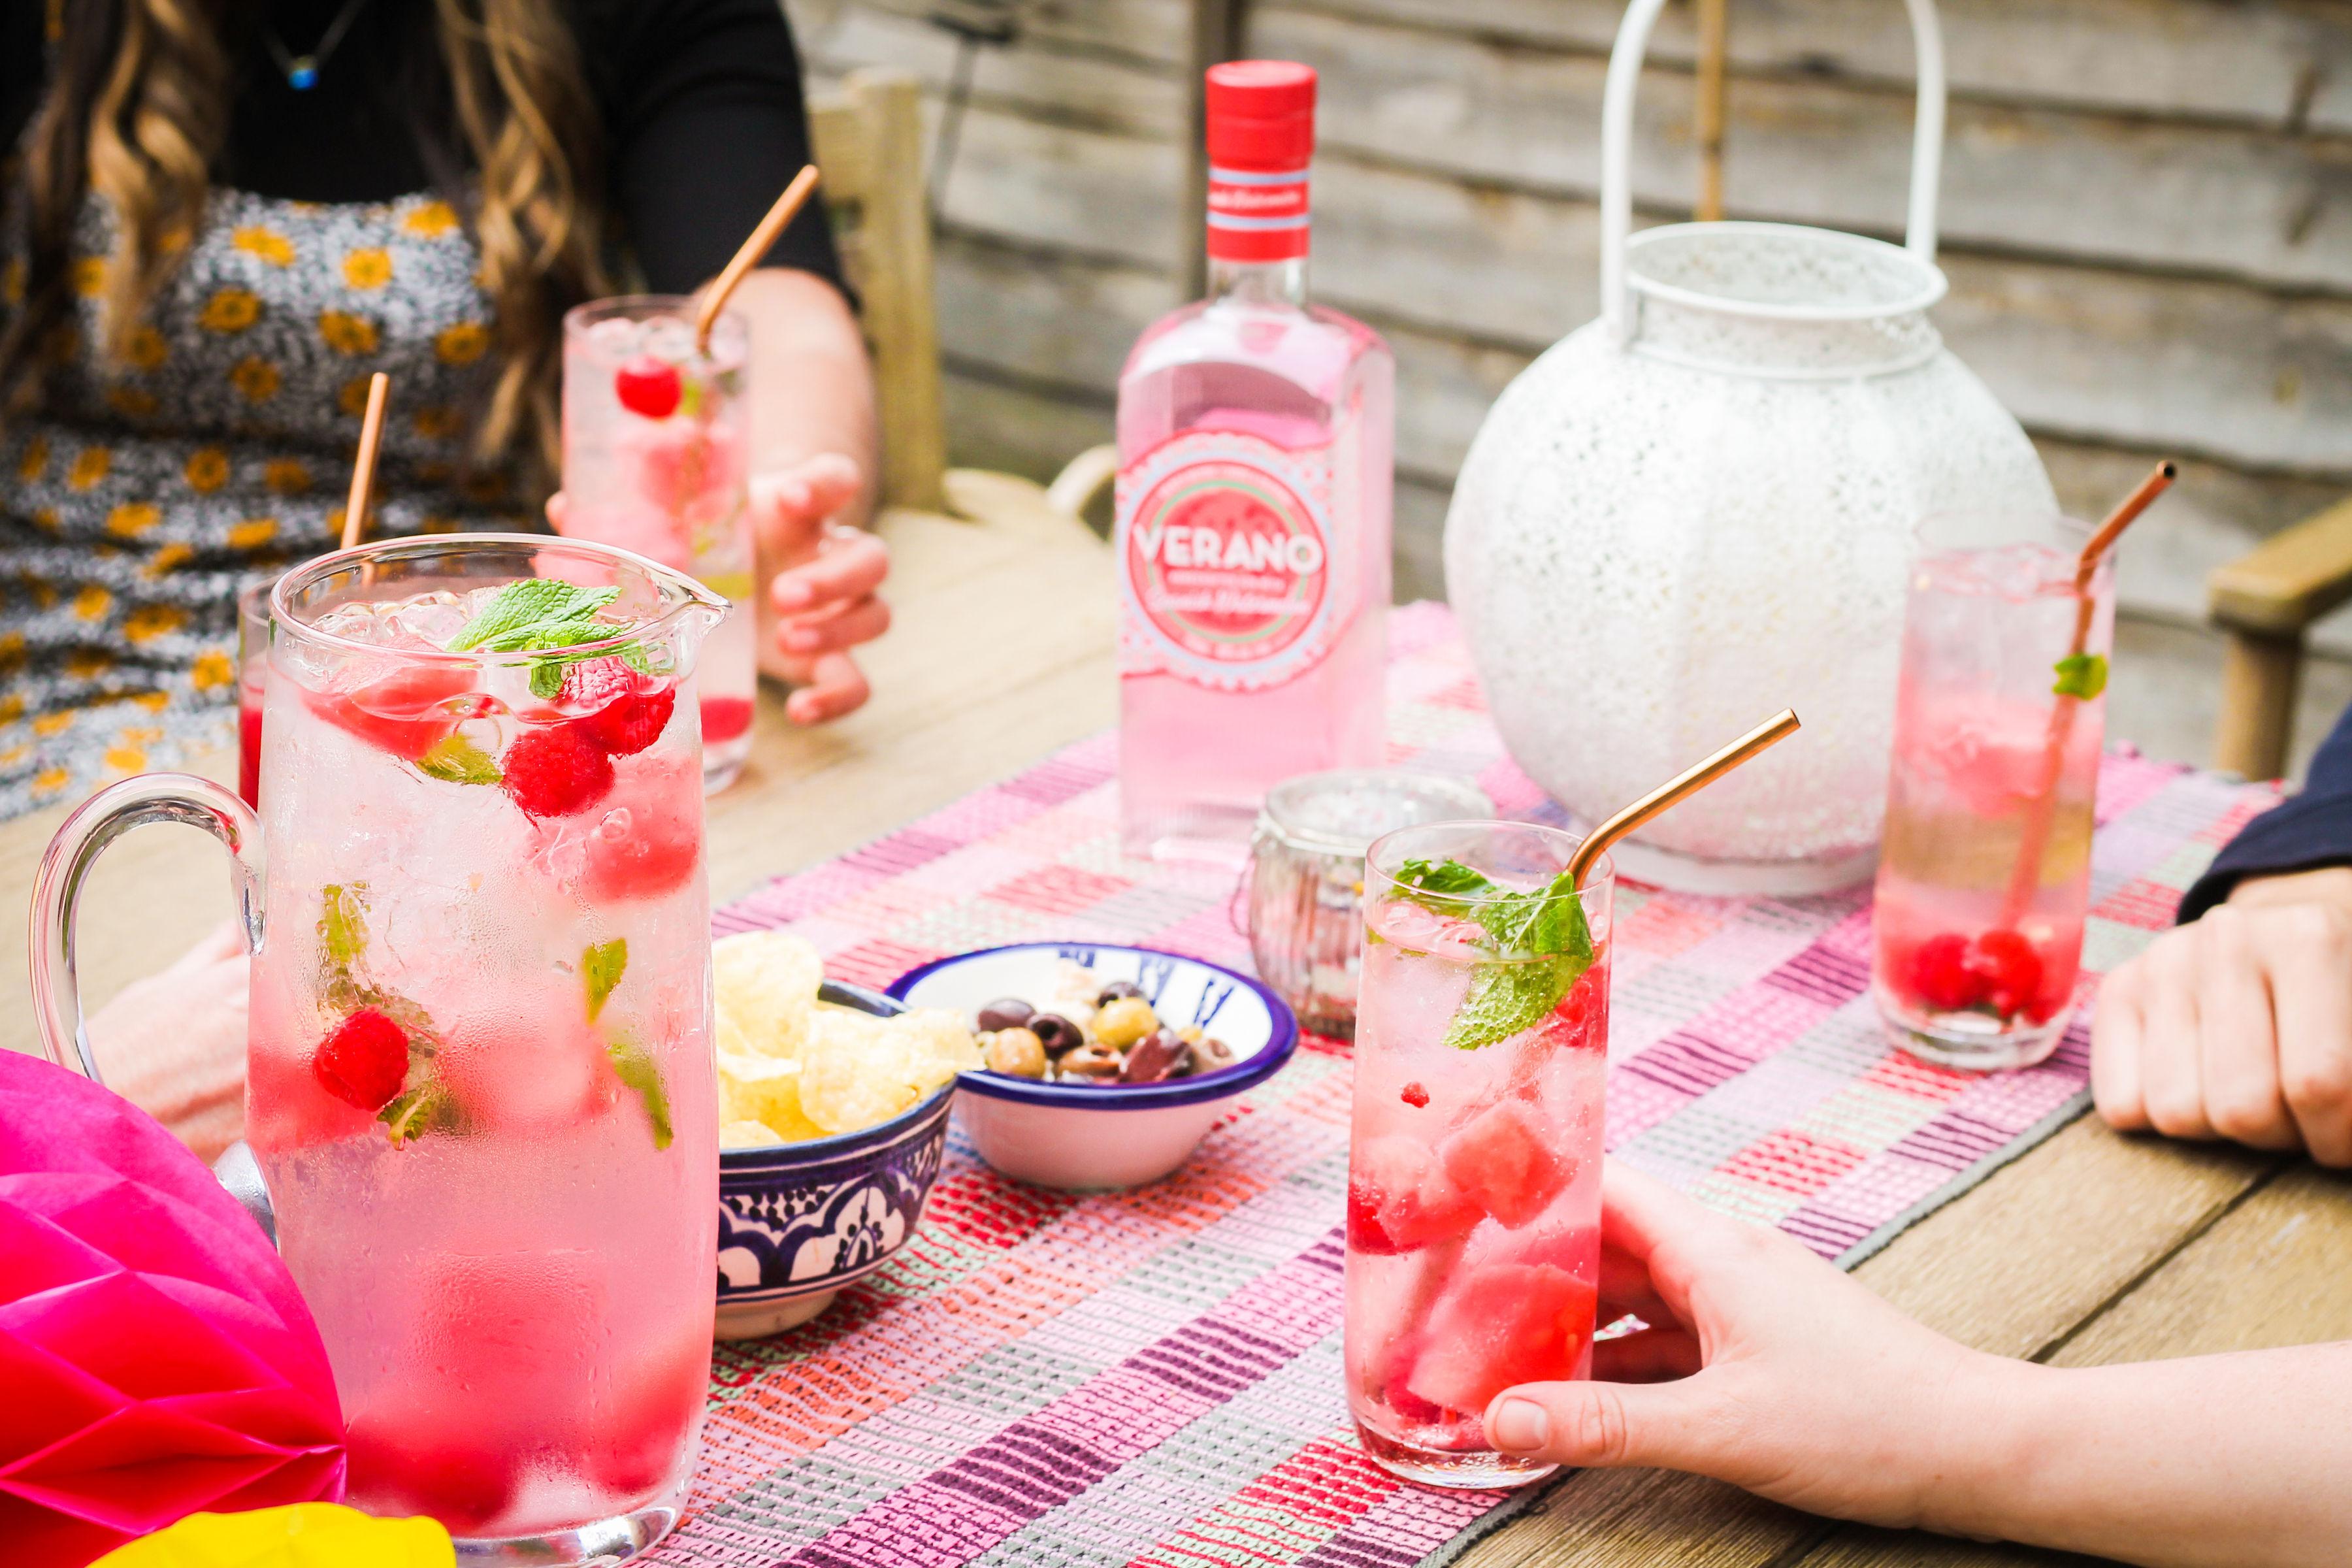 People celebration a Verano pinkish gin